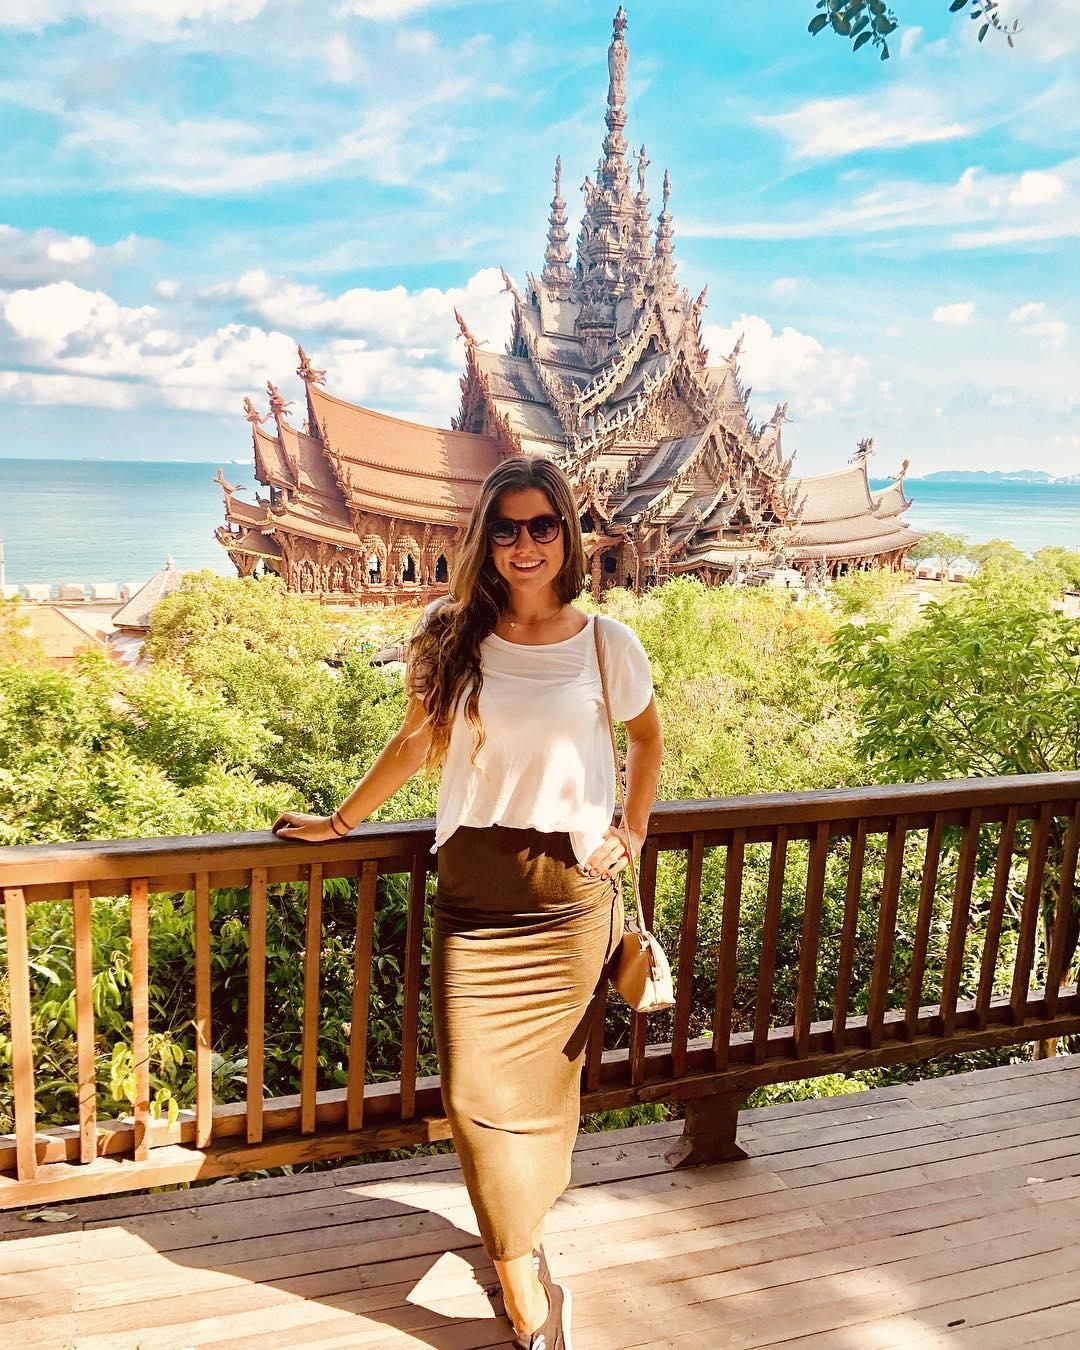 thailan_kinh-nghiem-du-lich-pattaya-09